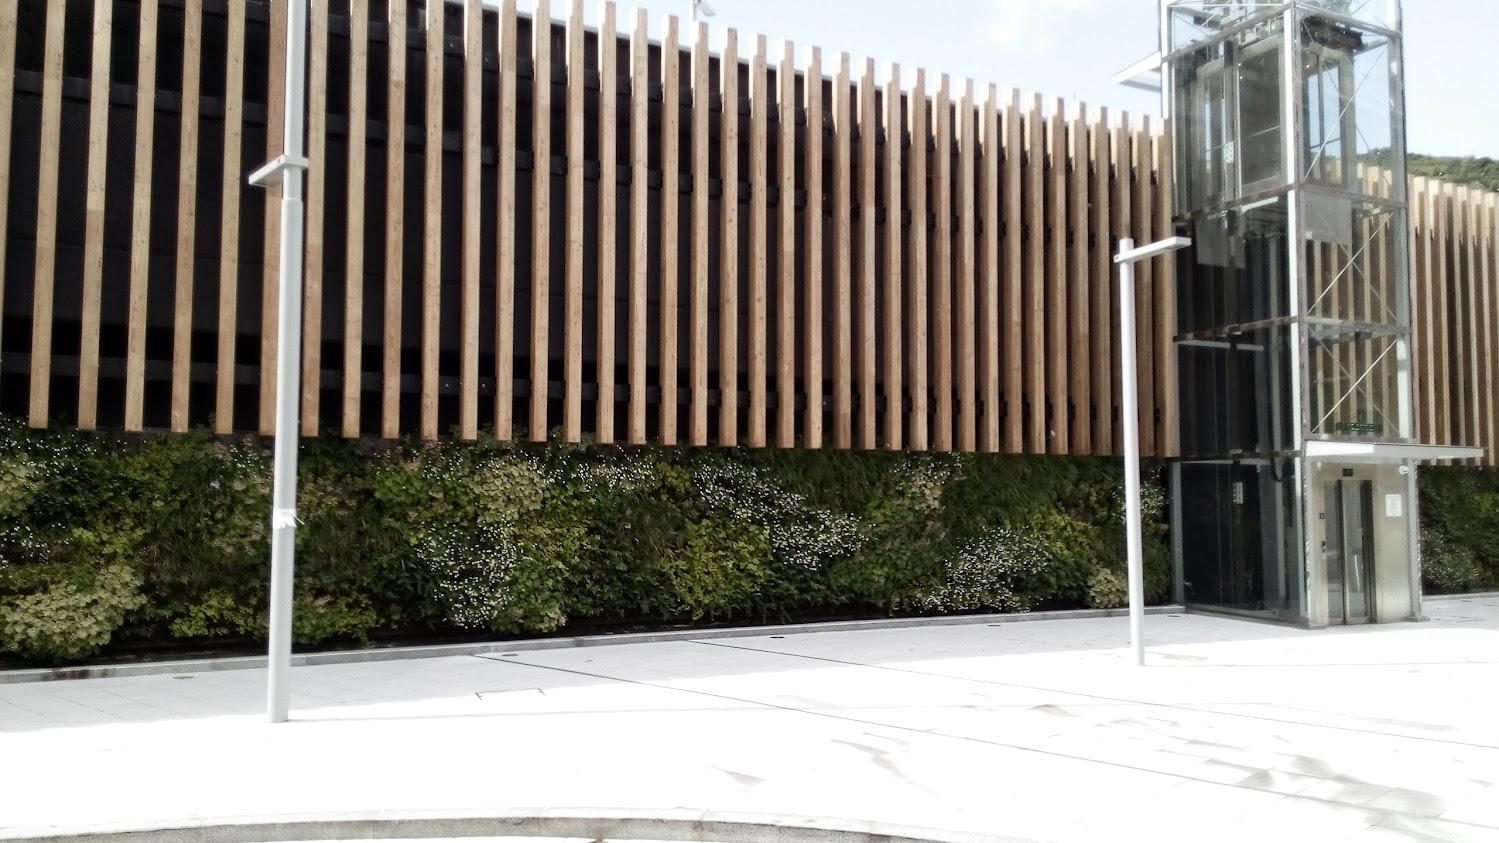 Jardin vertical Bilbao